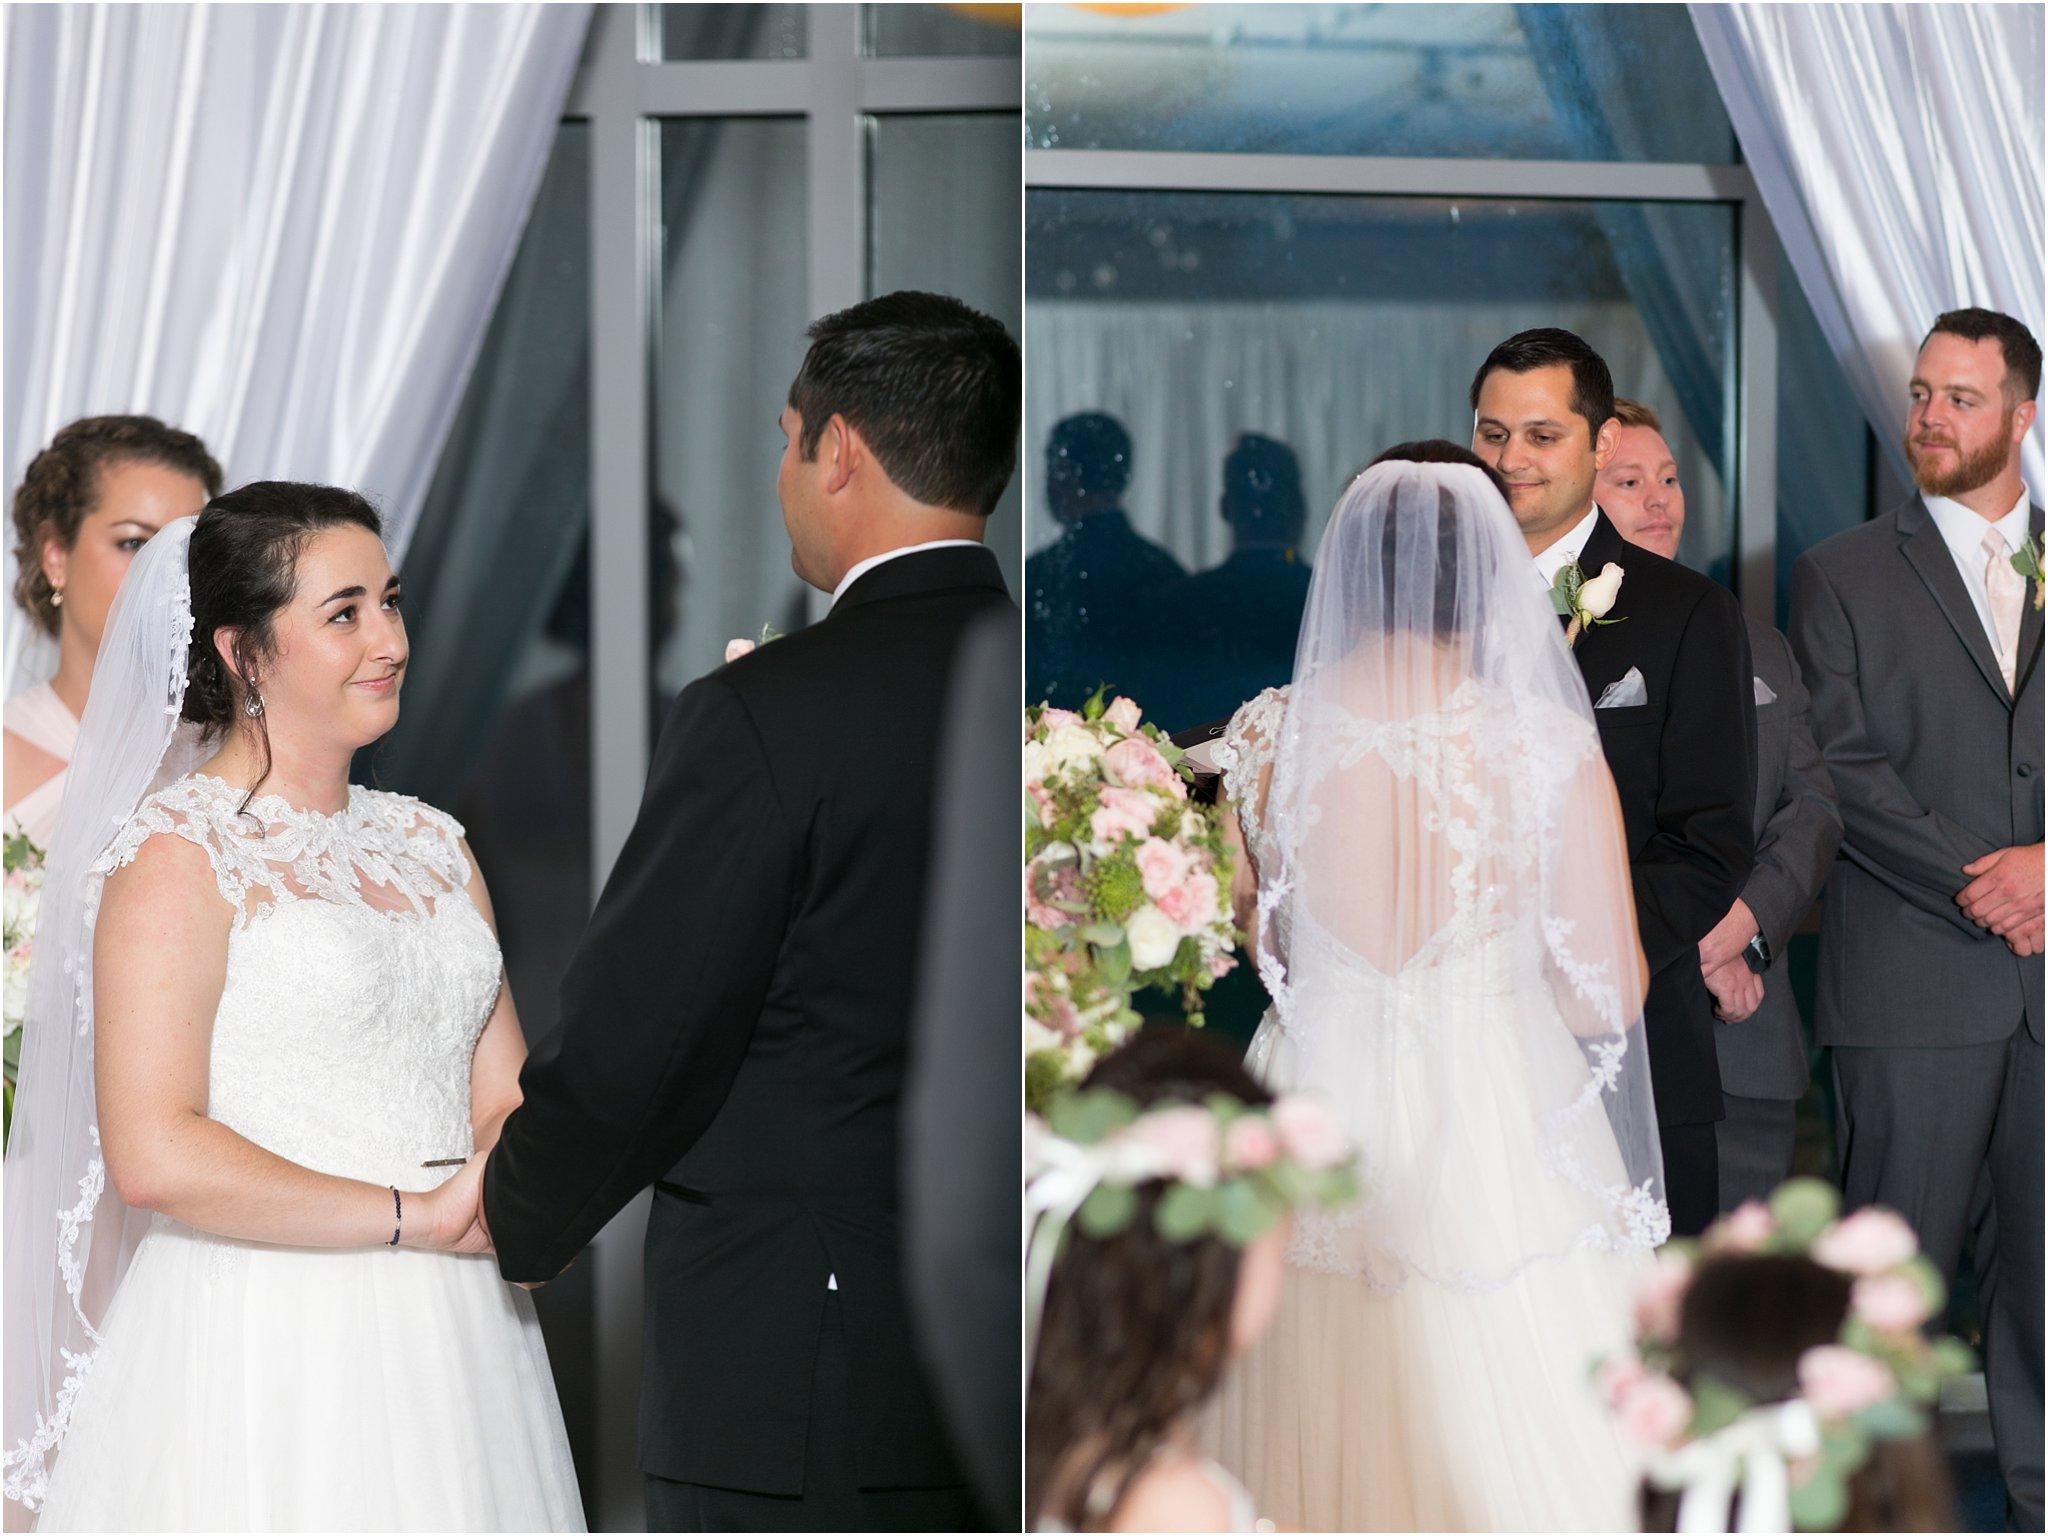 jessica_ryan_photography_virginia_wedding_photographer_wedding_hurricane_norfolk_botanical_gardens_hurricane_matthew_wedding_3592